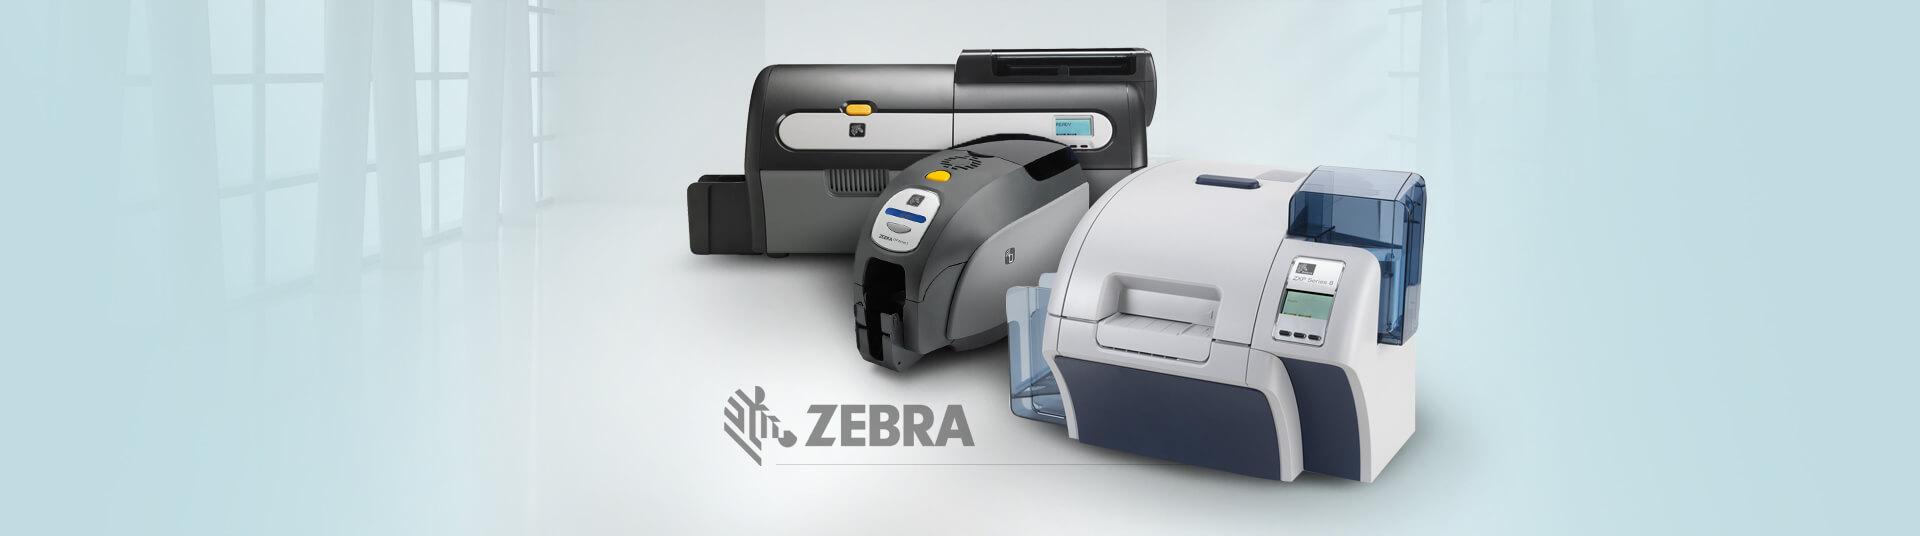 Zebra ID Badge Printer